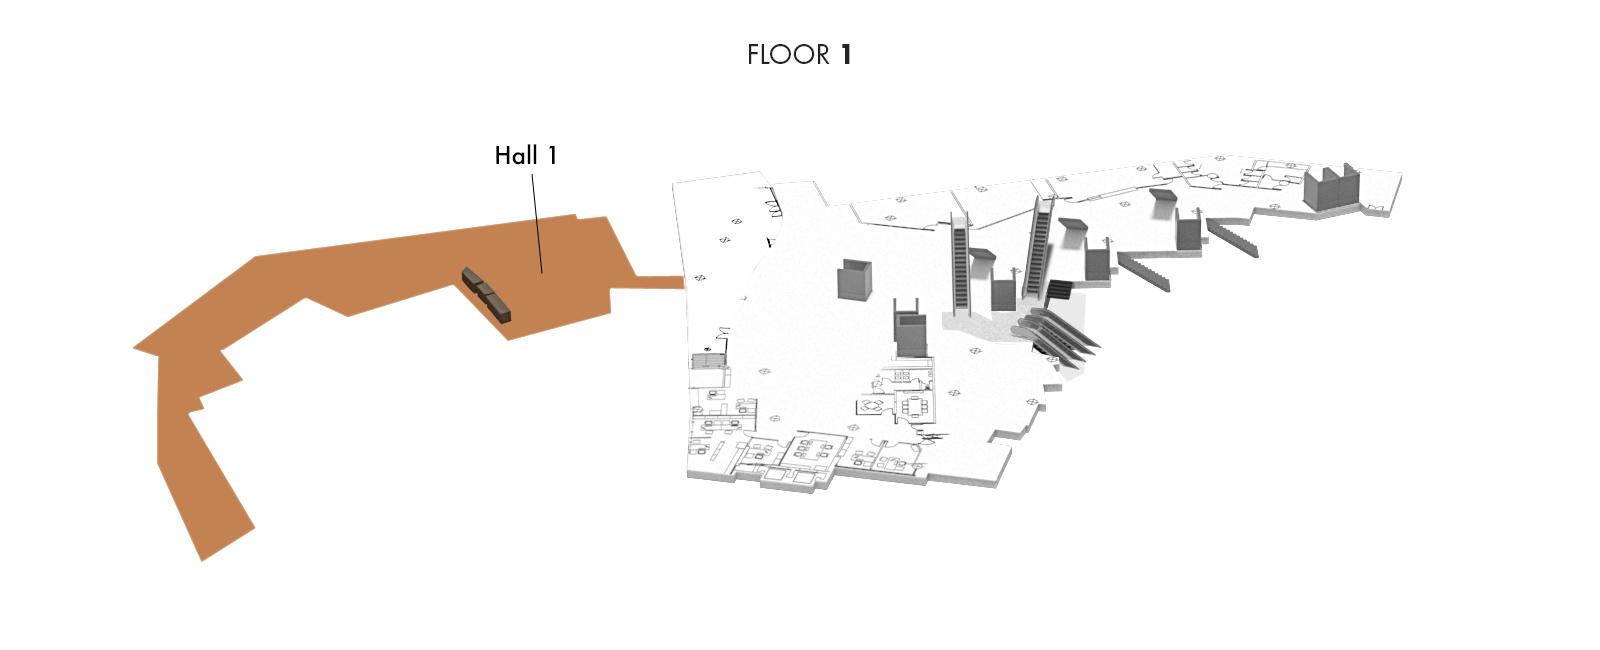 Hall 1, Floor 1   Palacio Euskalduna Jauregia